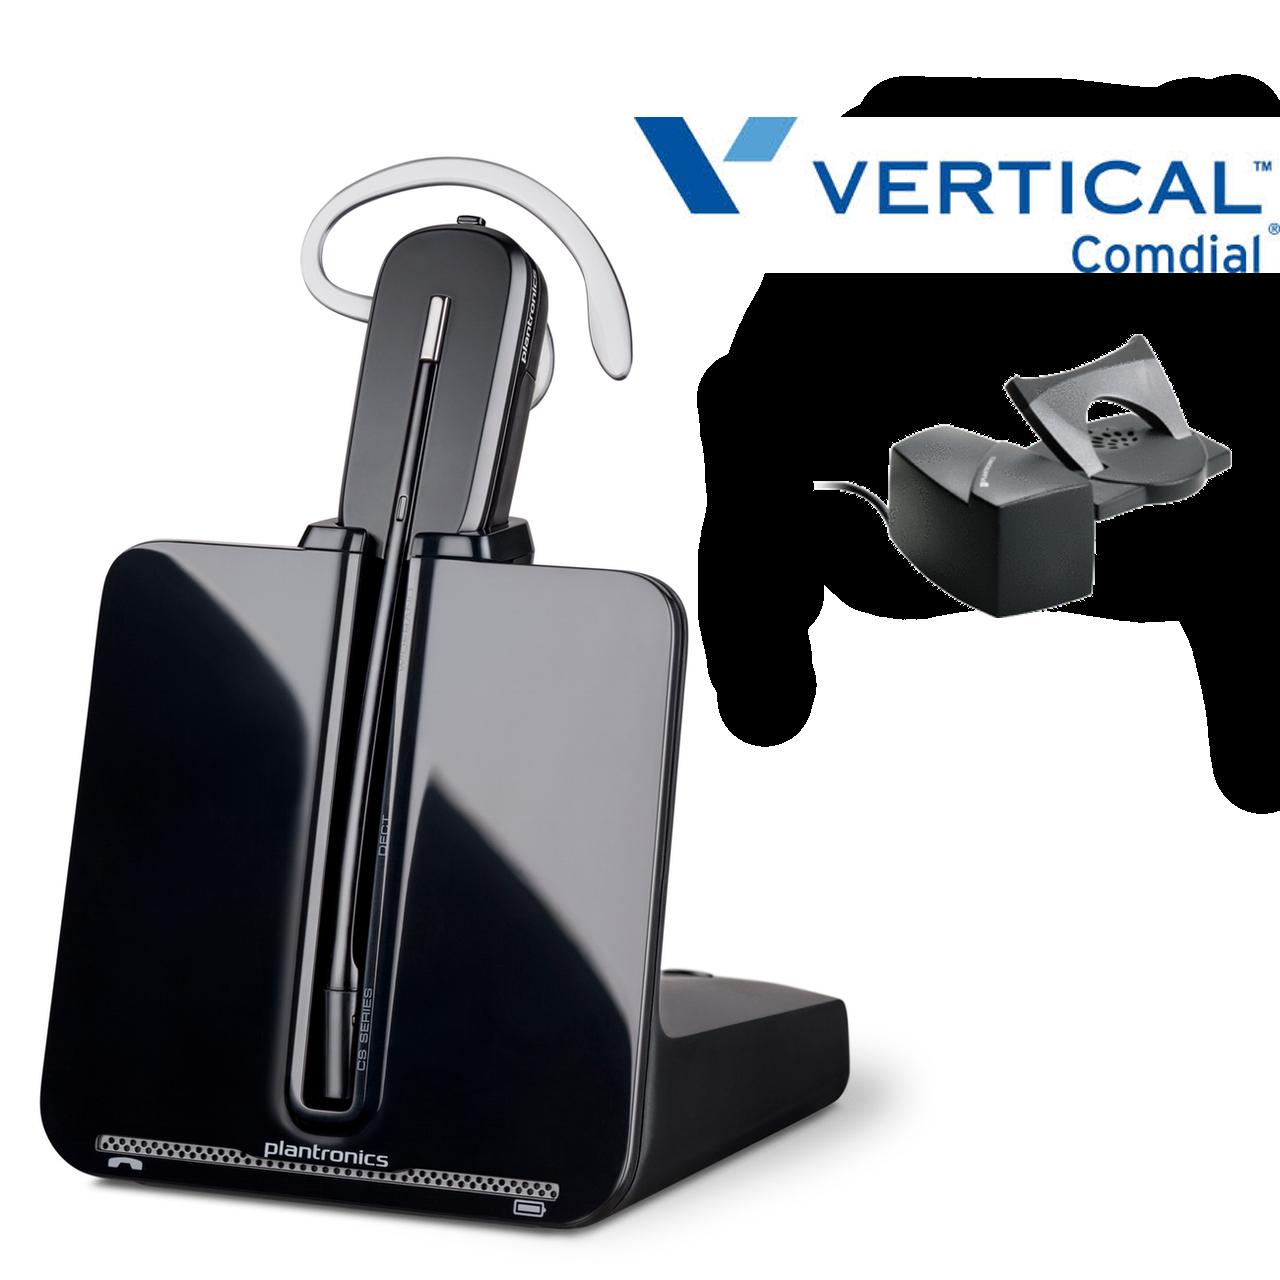 Vertical Edge 700 Bluetooth Adapter Module Vw E700 Bt New: Comdial Vertical Compatible Plantronics Wireless Headset